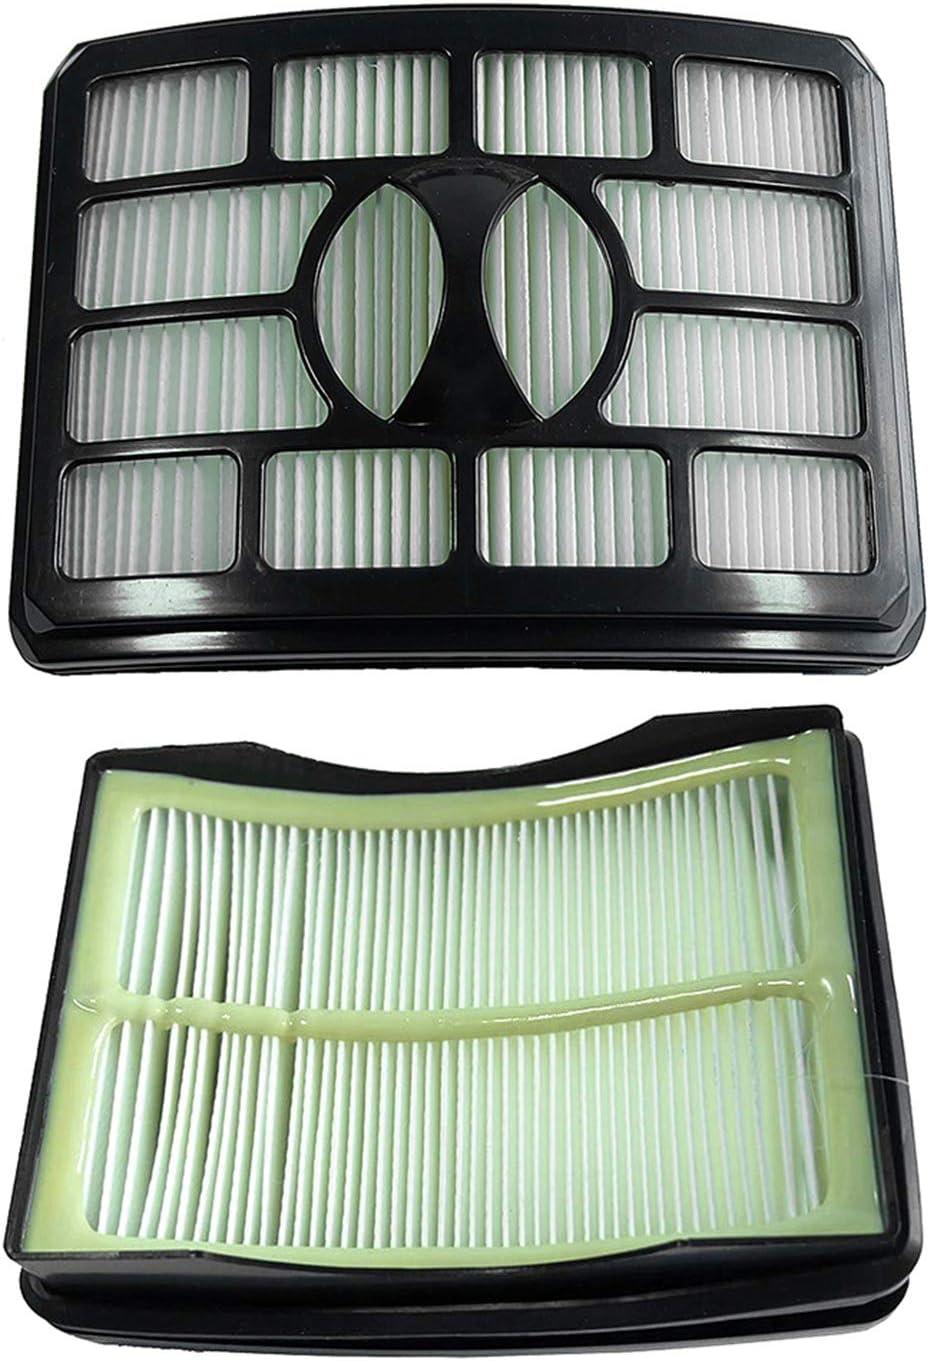 Noblik Filter Elements for Shark Rotator Professional Lift-Away Nv500 Xff500 Xhf500